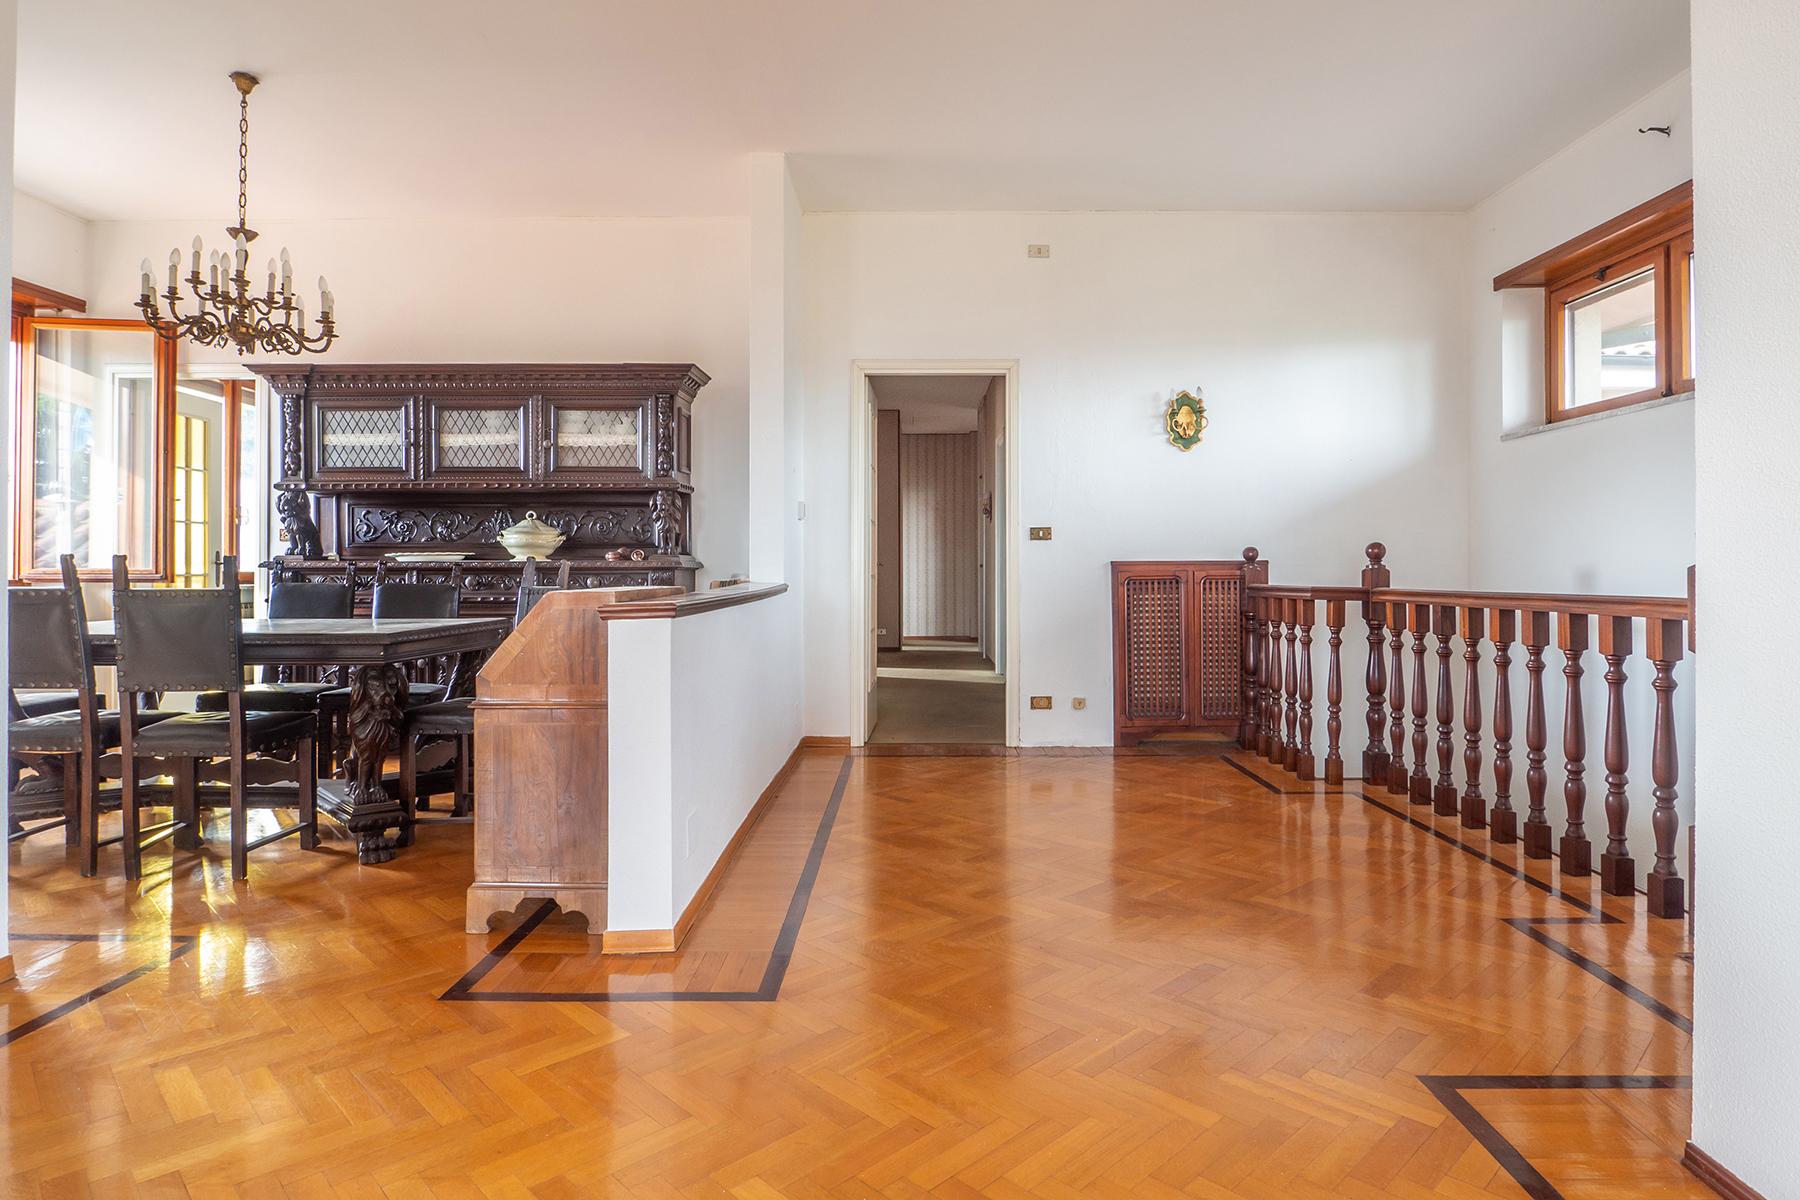 Casa indipendente in Vendita a Torino: 5 locali, 277 mq - Foto 5